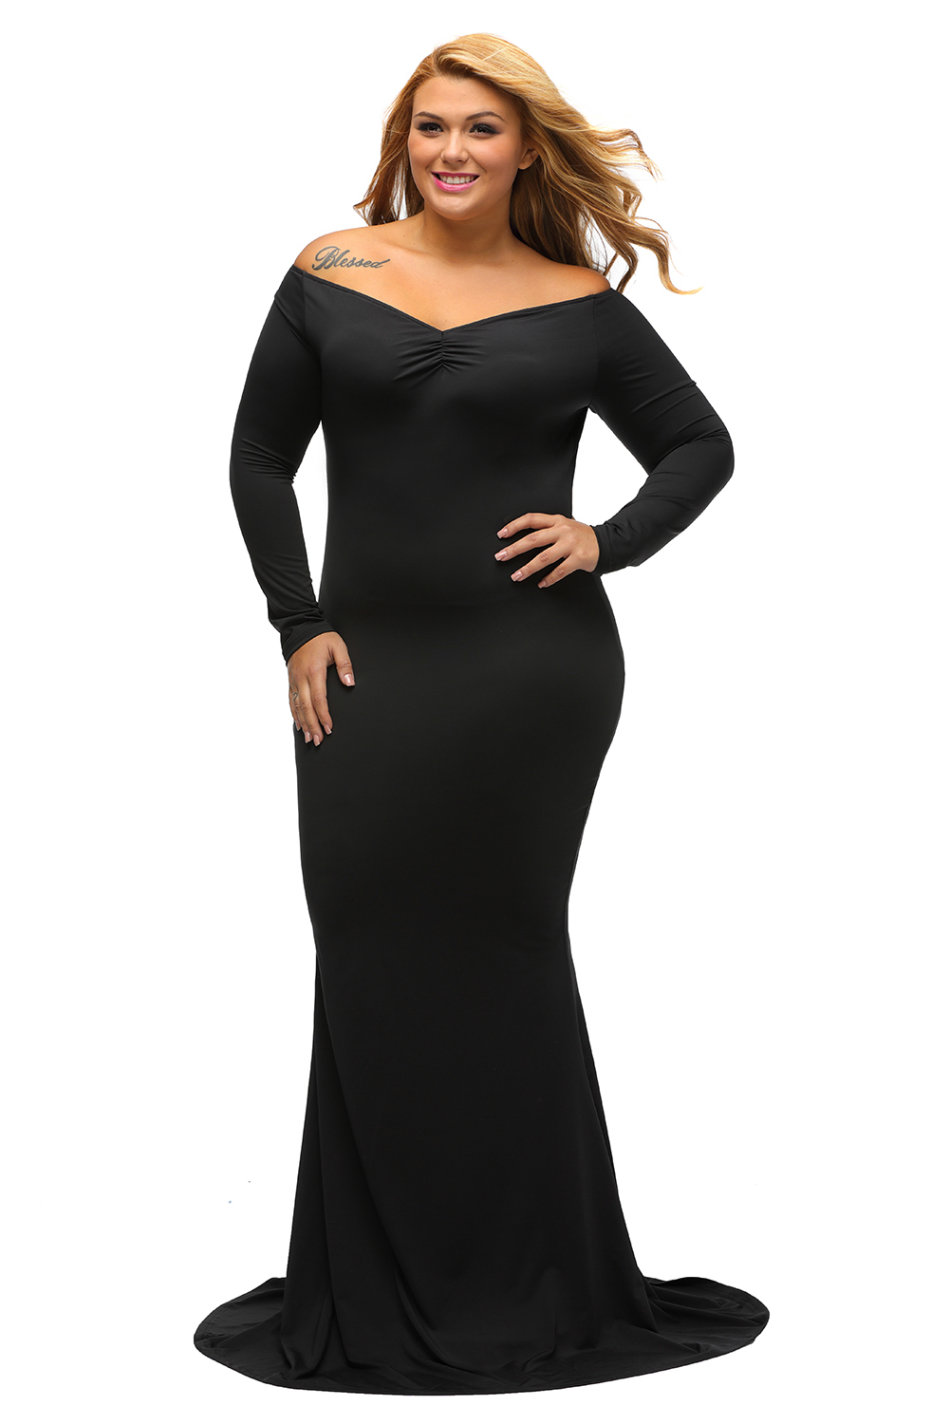 Plus Size Evening Dresses Used   Huston Fislar Photography